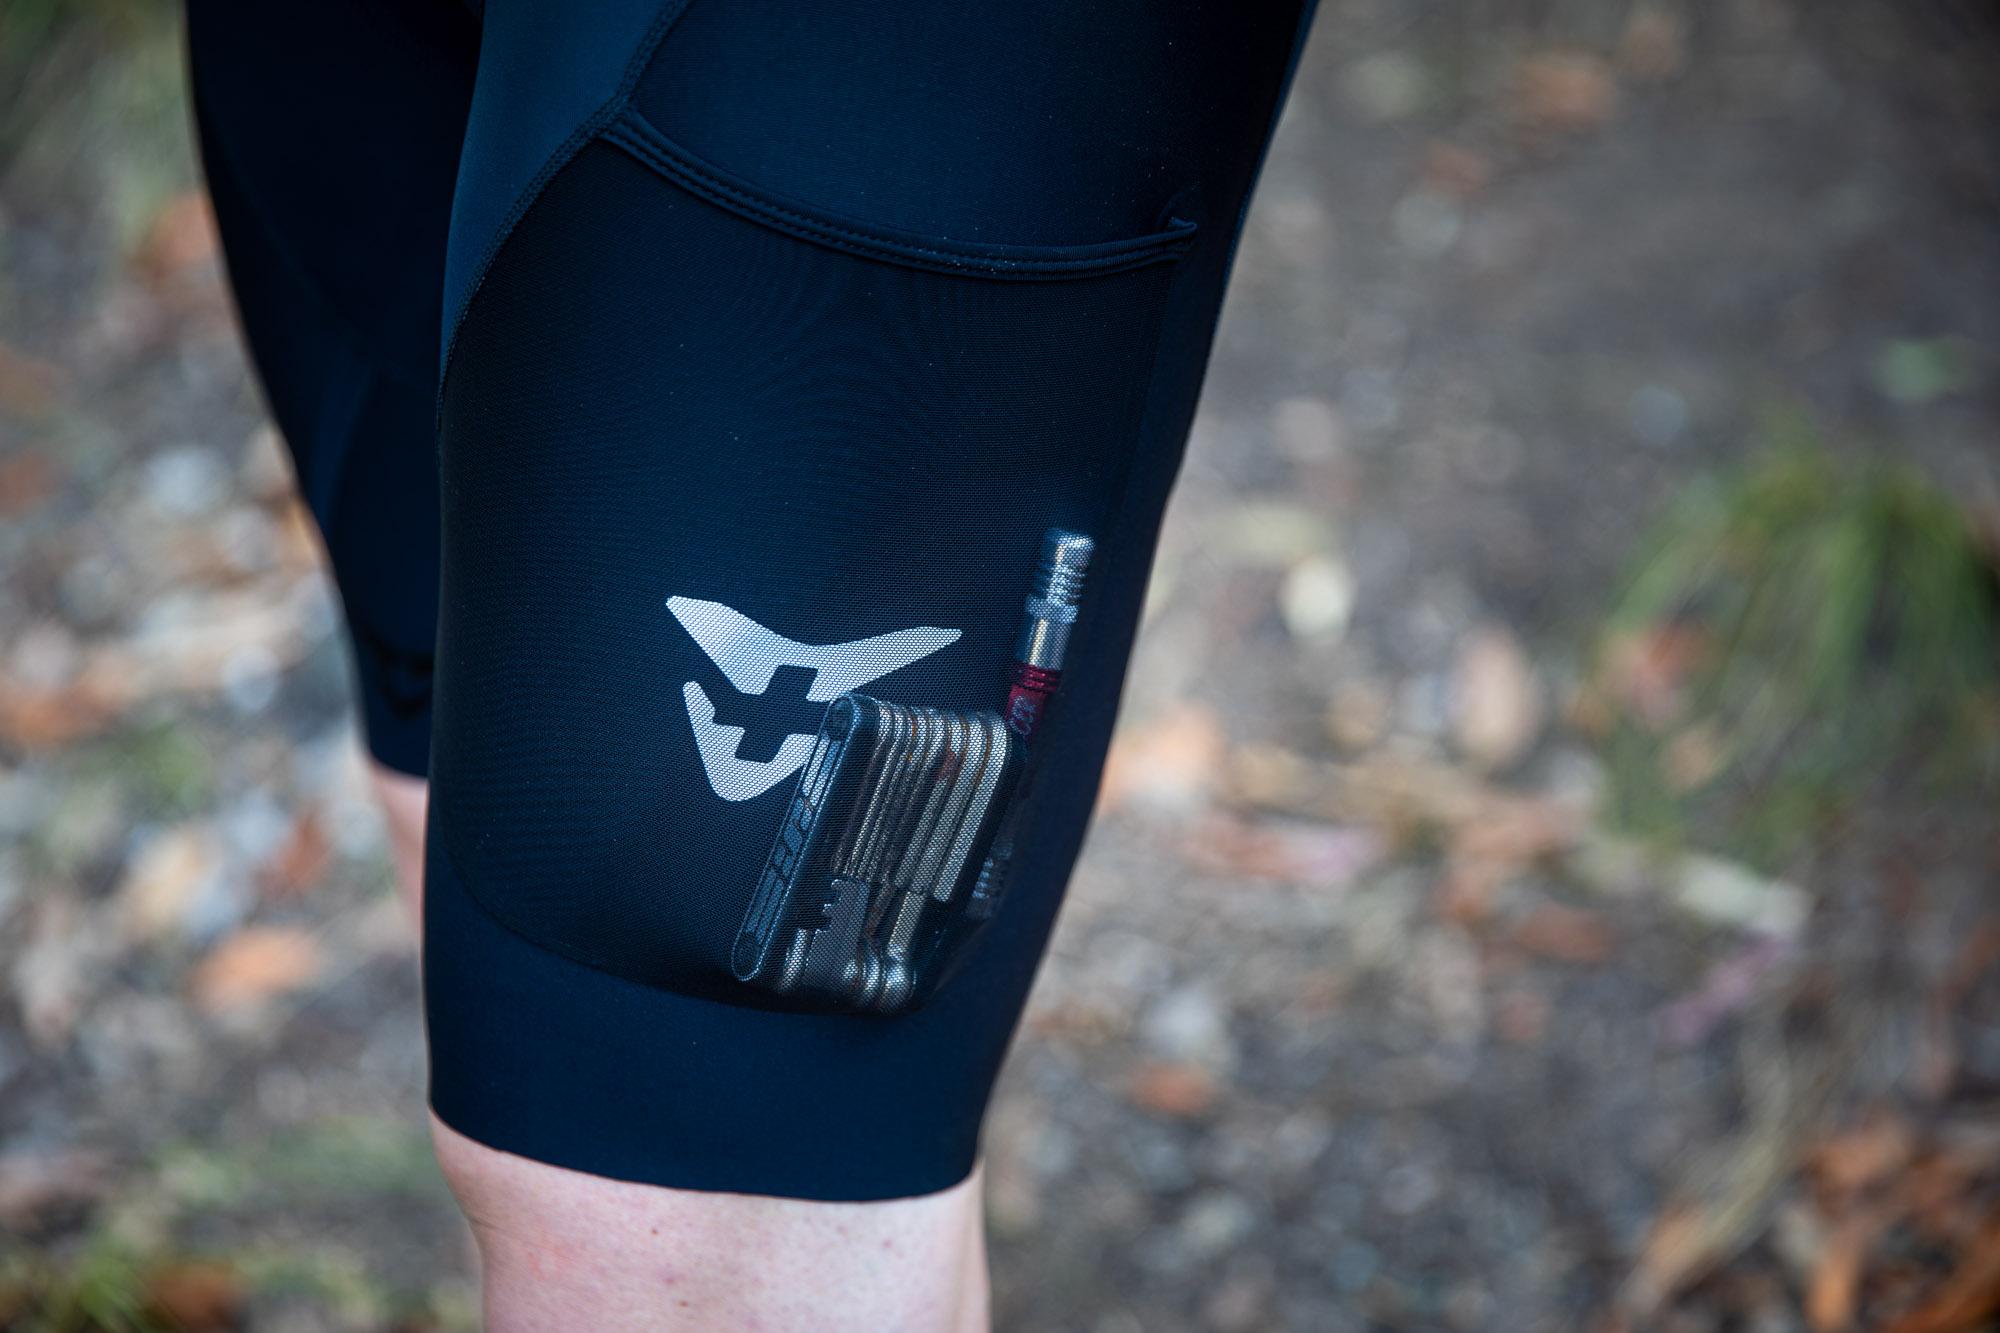 Cuore Pioneer cargo bib shorts